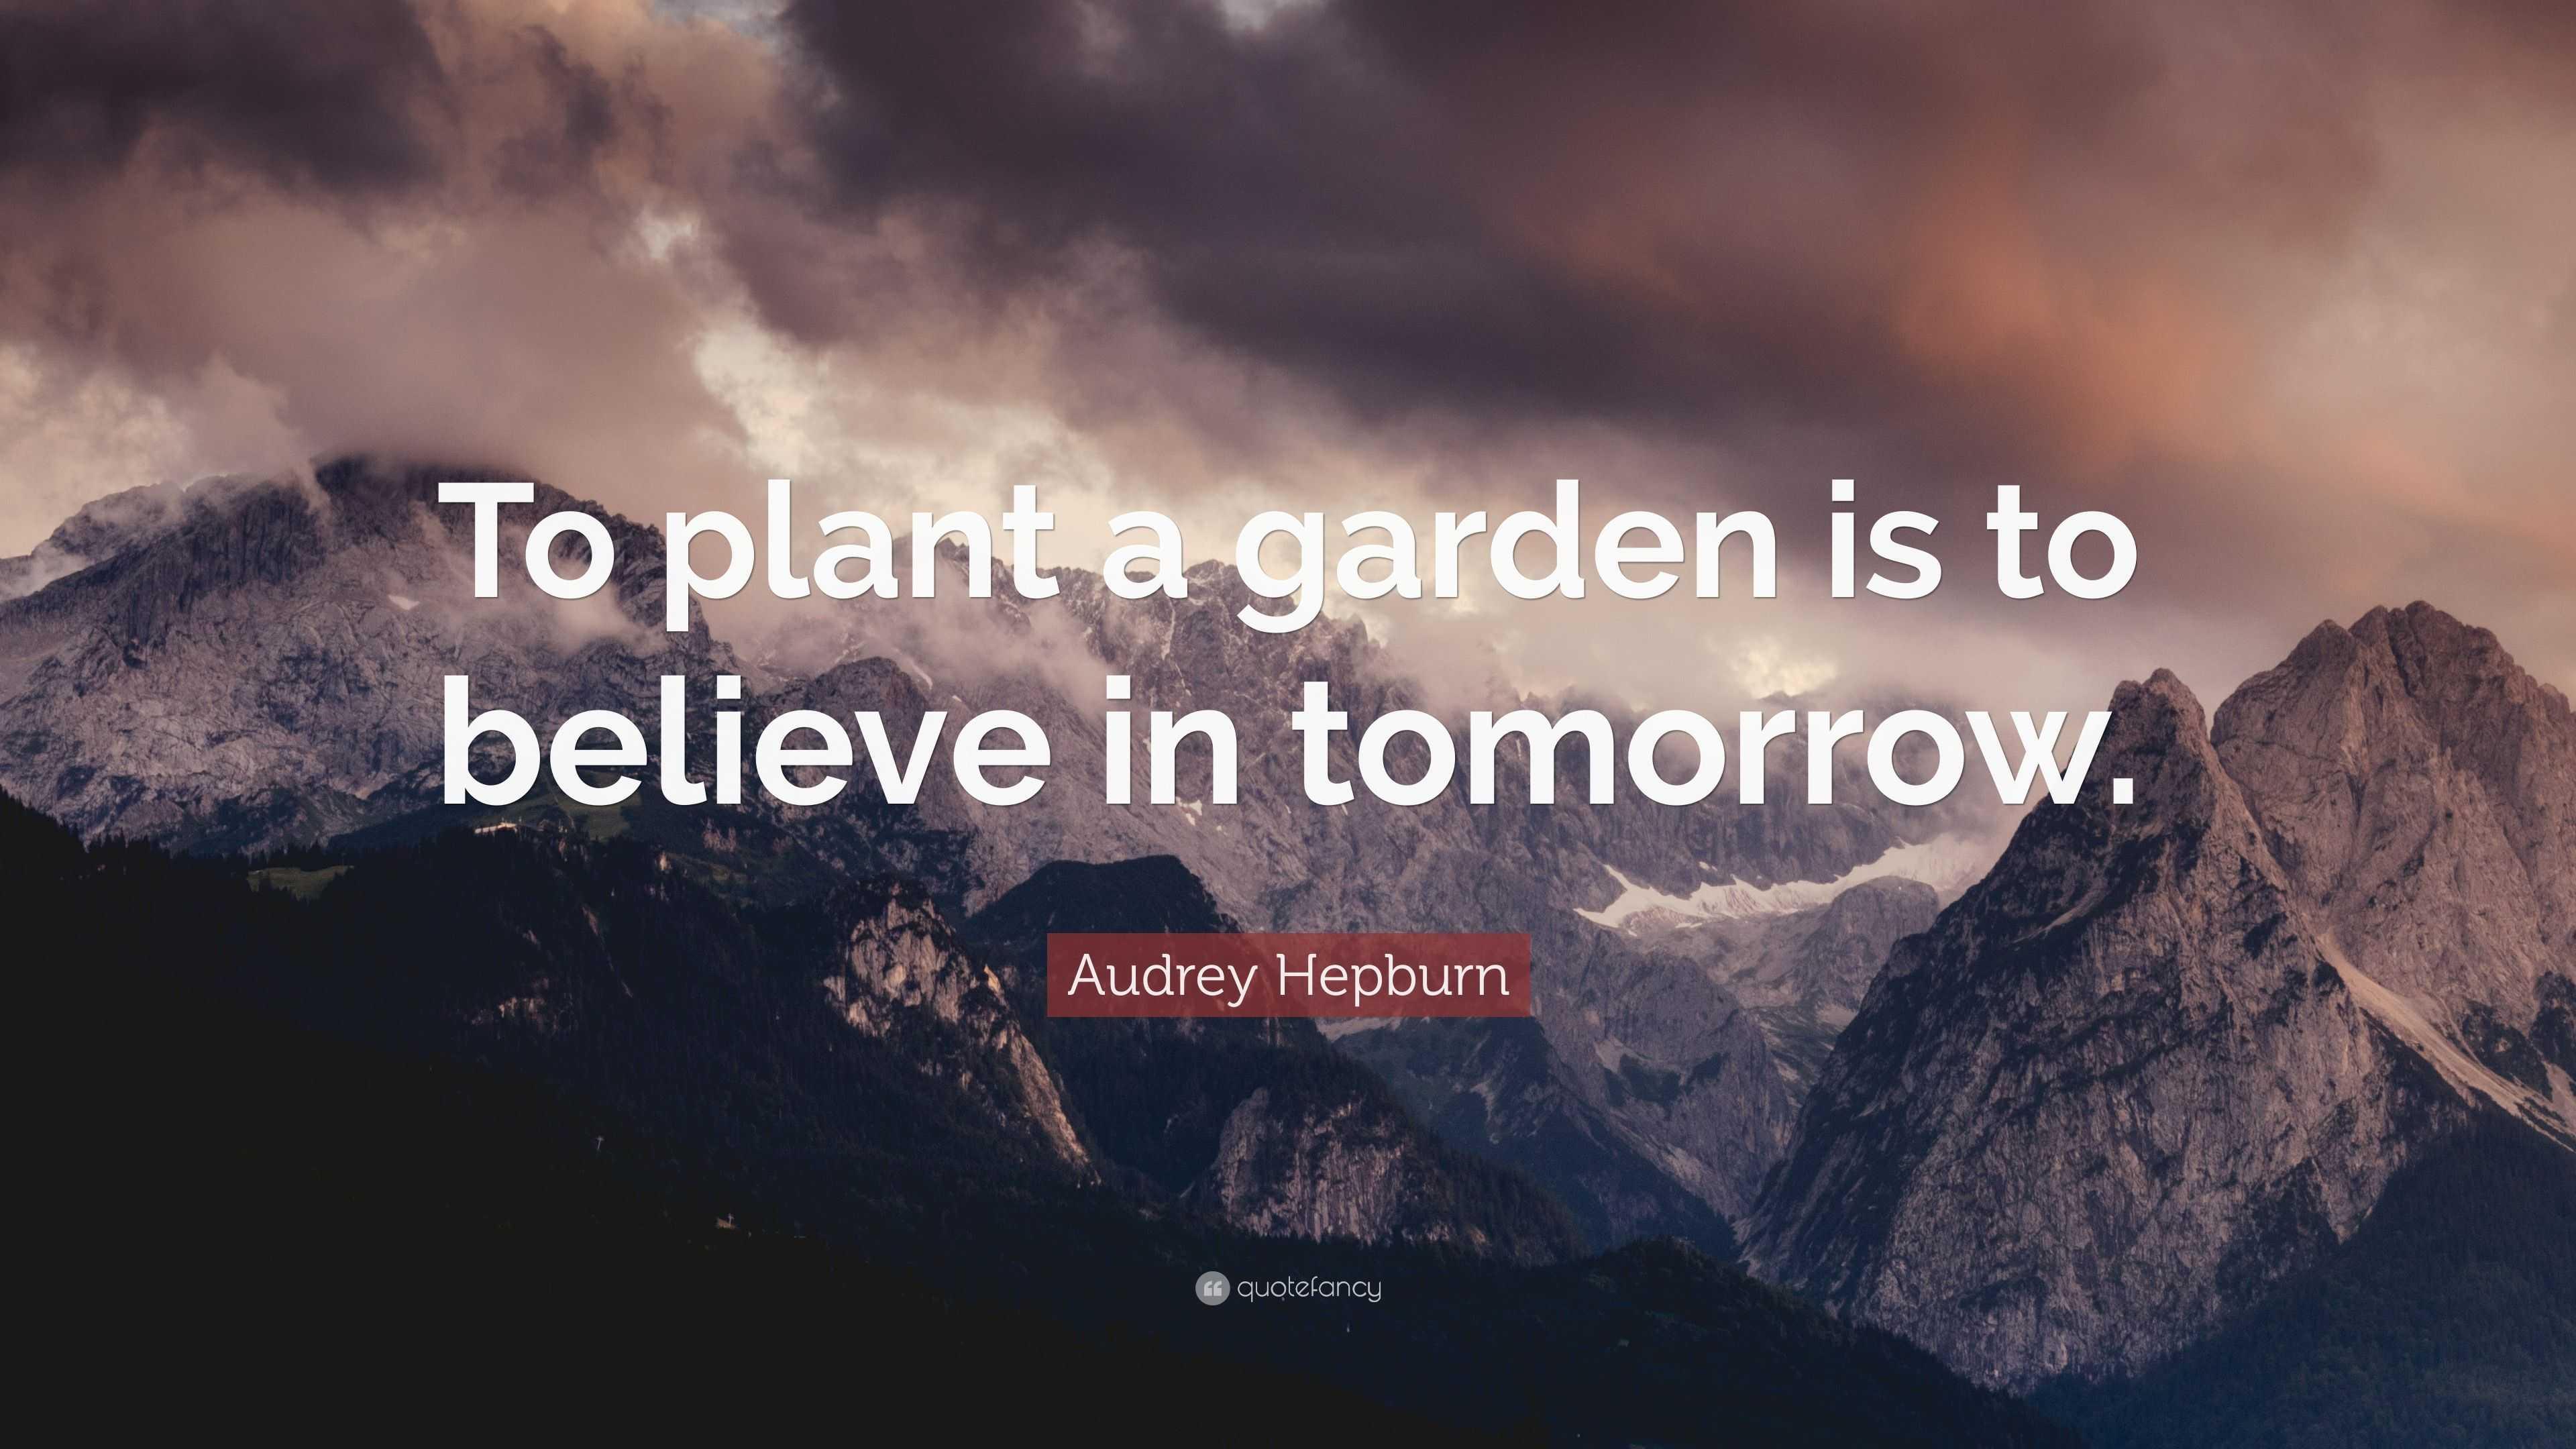 Audrey Hepburn Quote To Plant A Garden Is To Believe In Tomorrow 12 Wallpapers Quotefancy